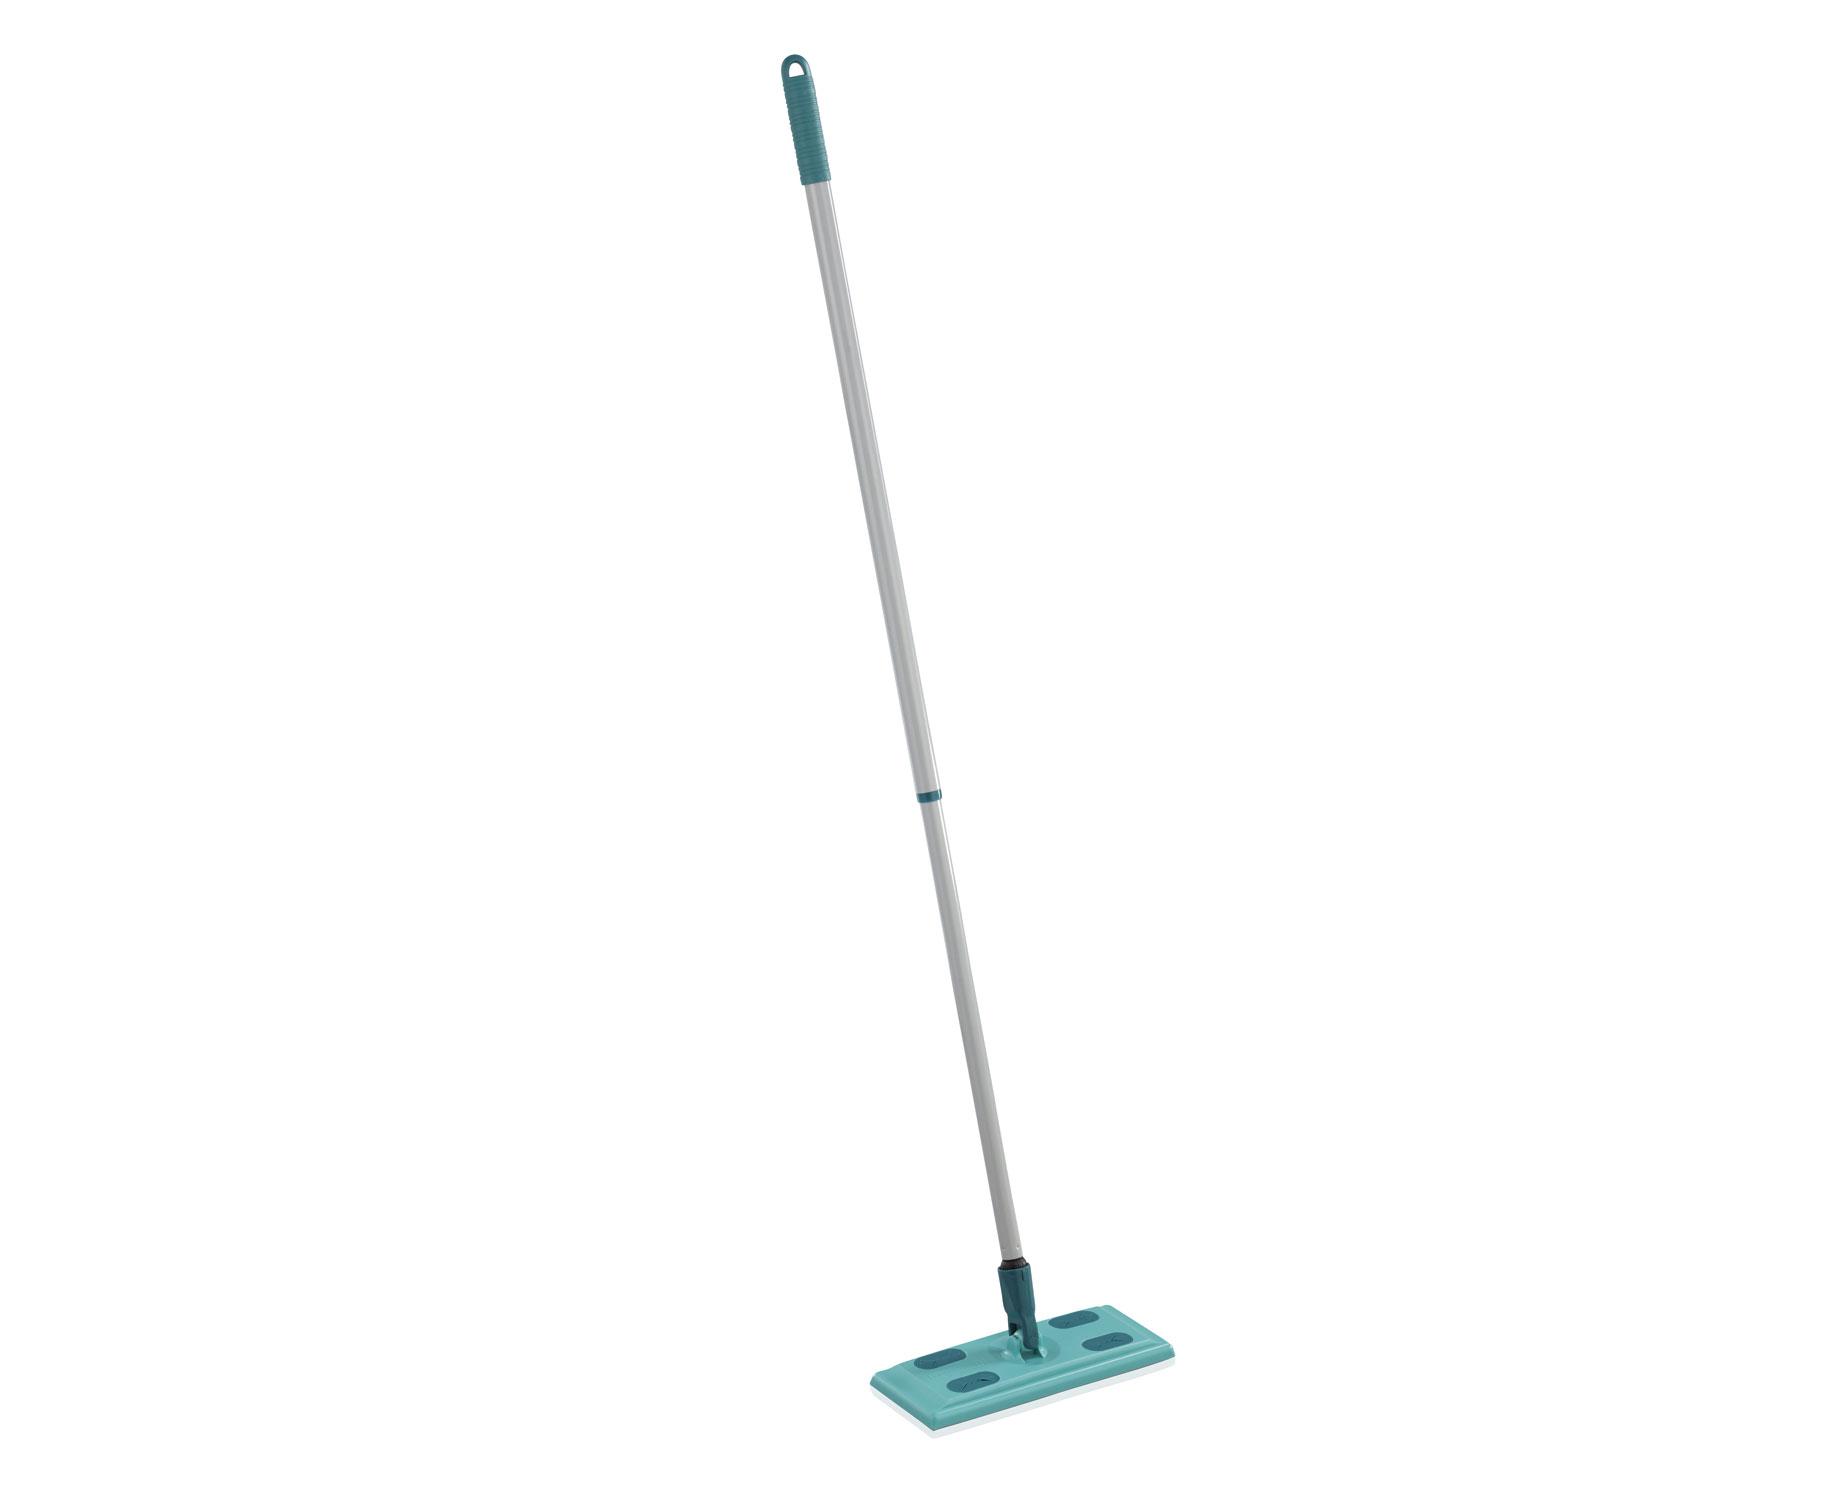 Leifheit Vloerwisser Clean En Away kopen in de aanbieding